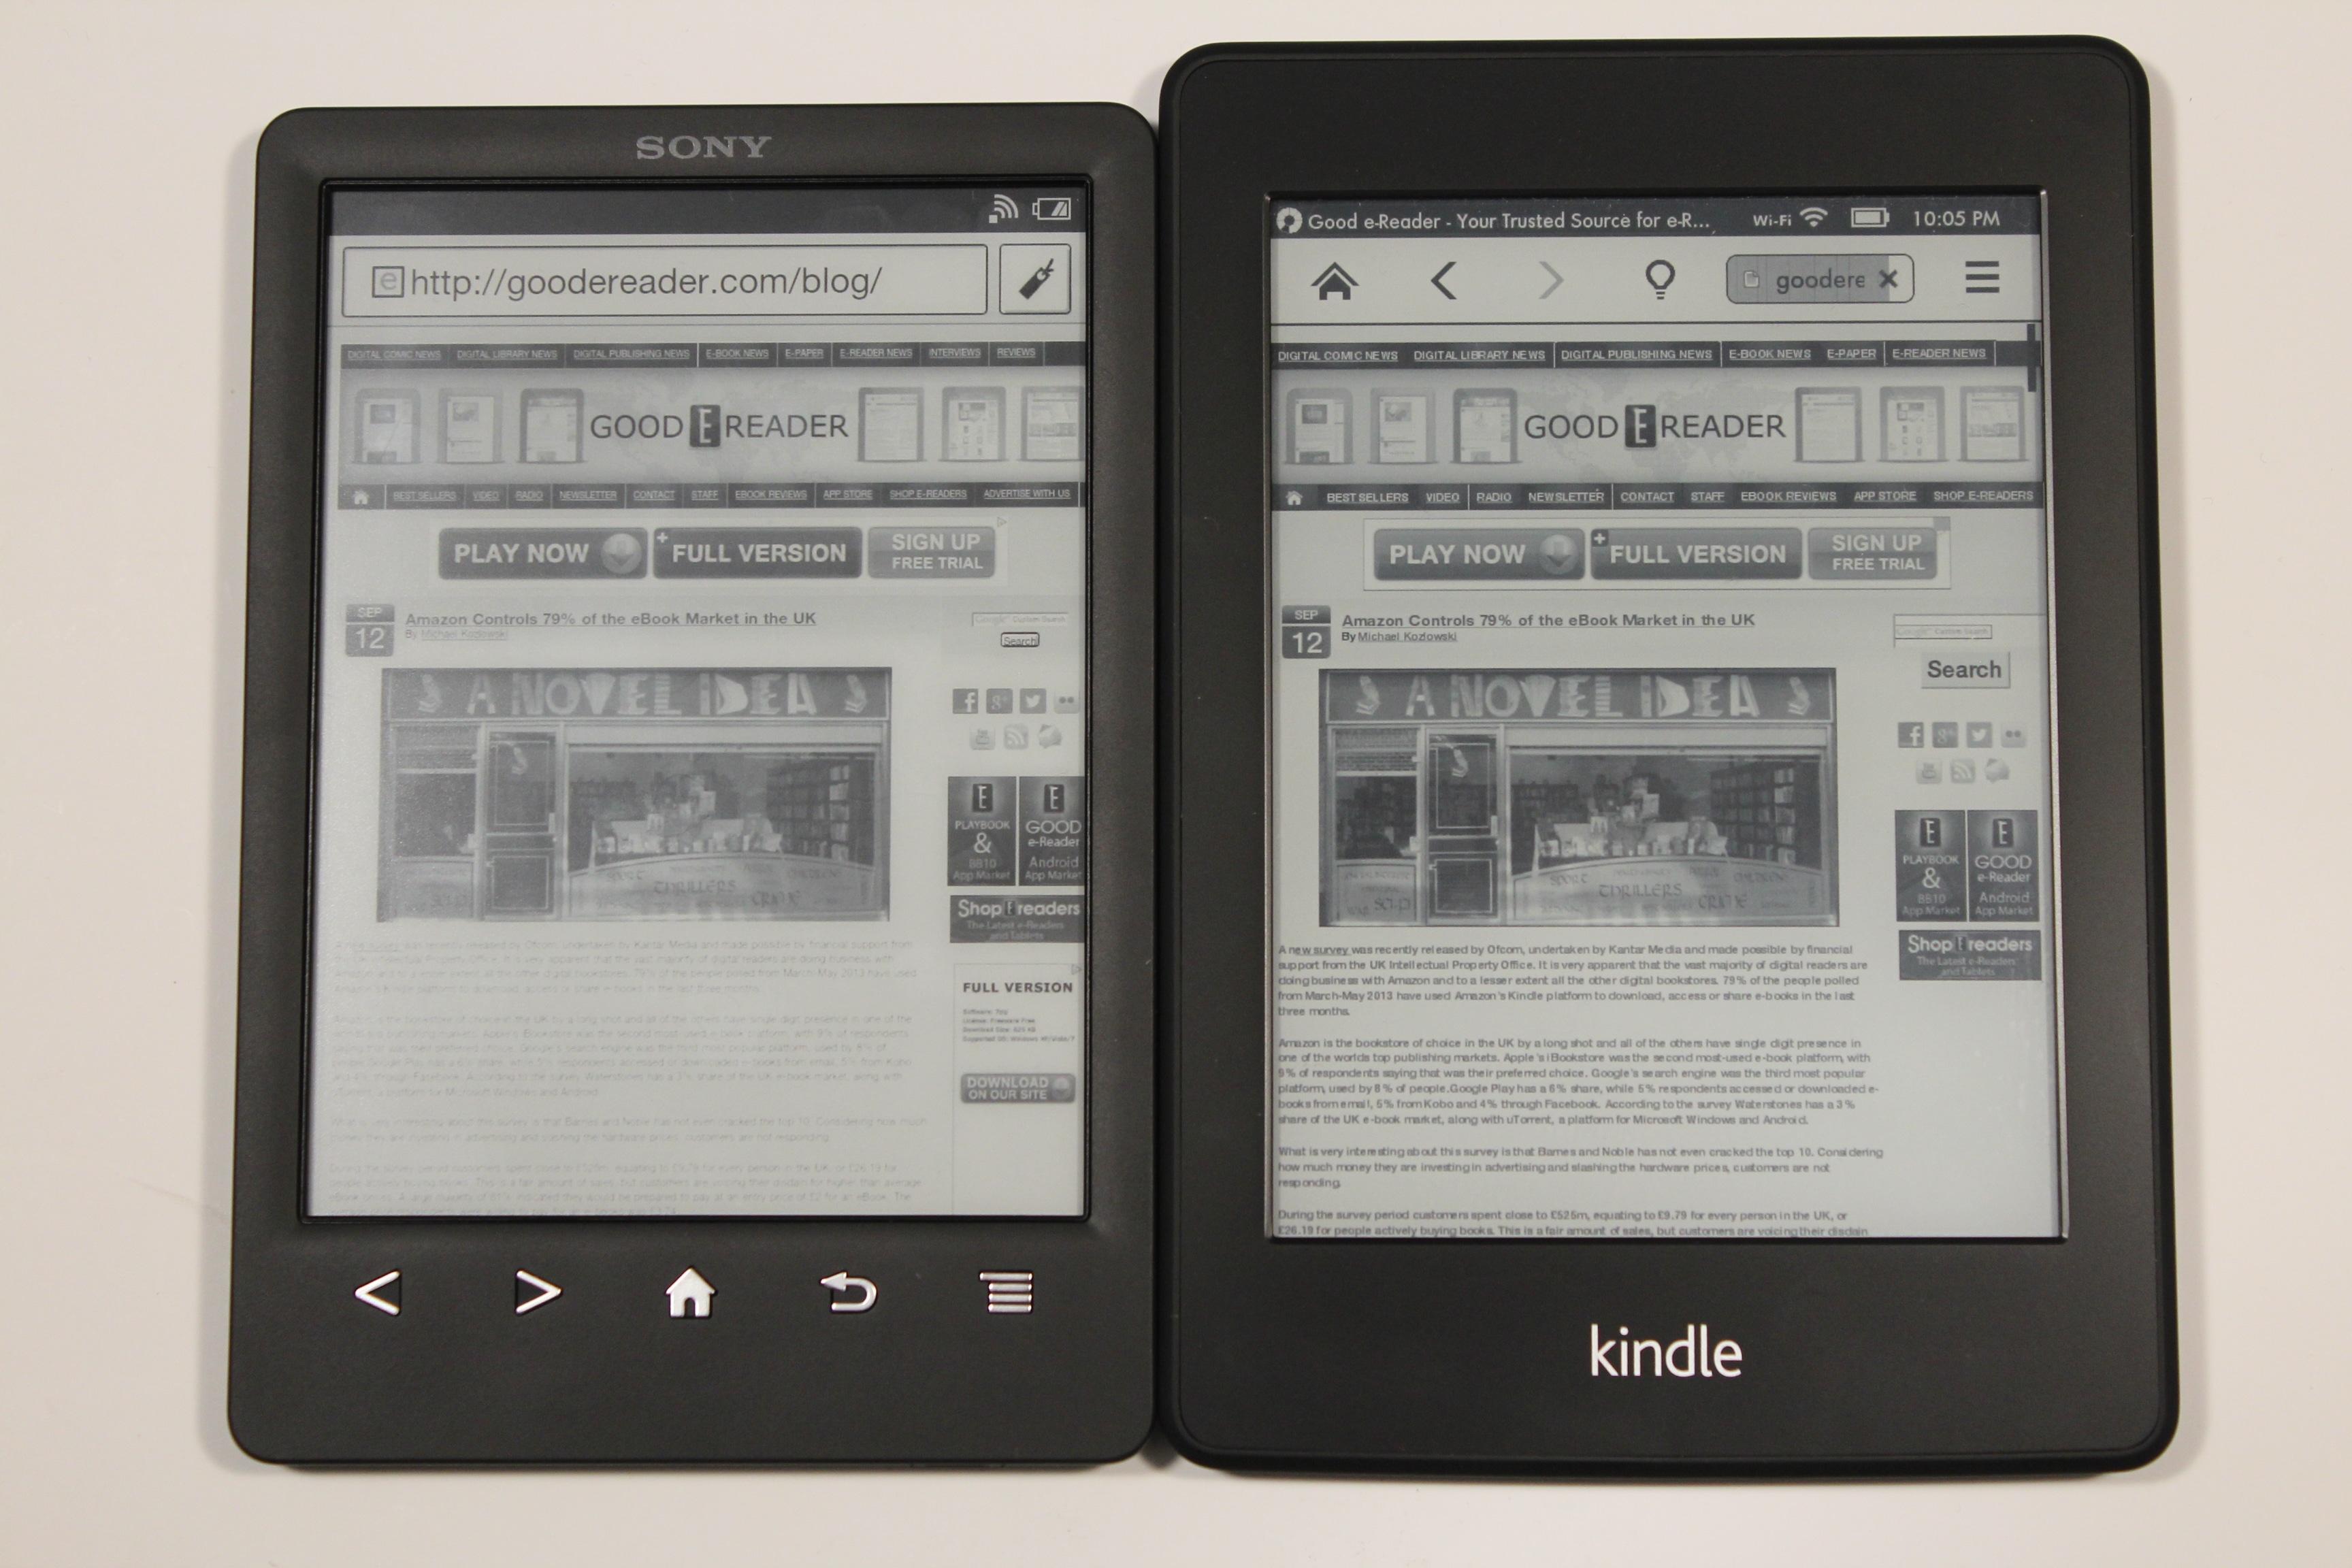 Kindle Vs Sony Reader: Sony PRS-T3 Vs Amazon Kindle Paperwhite